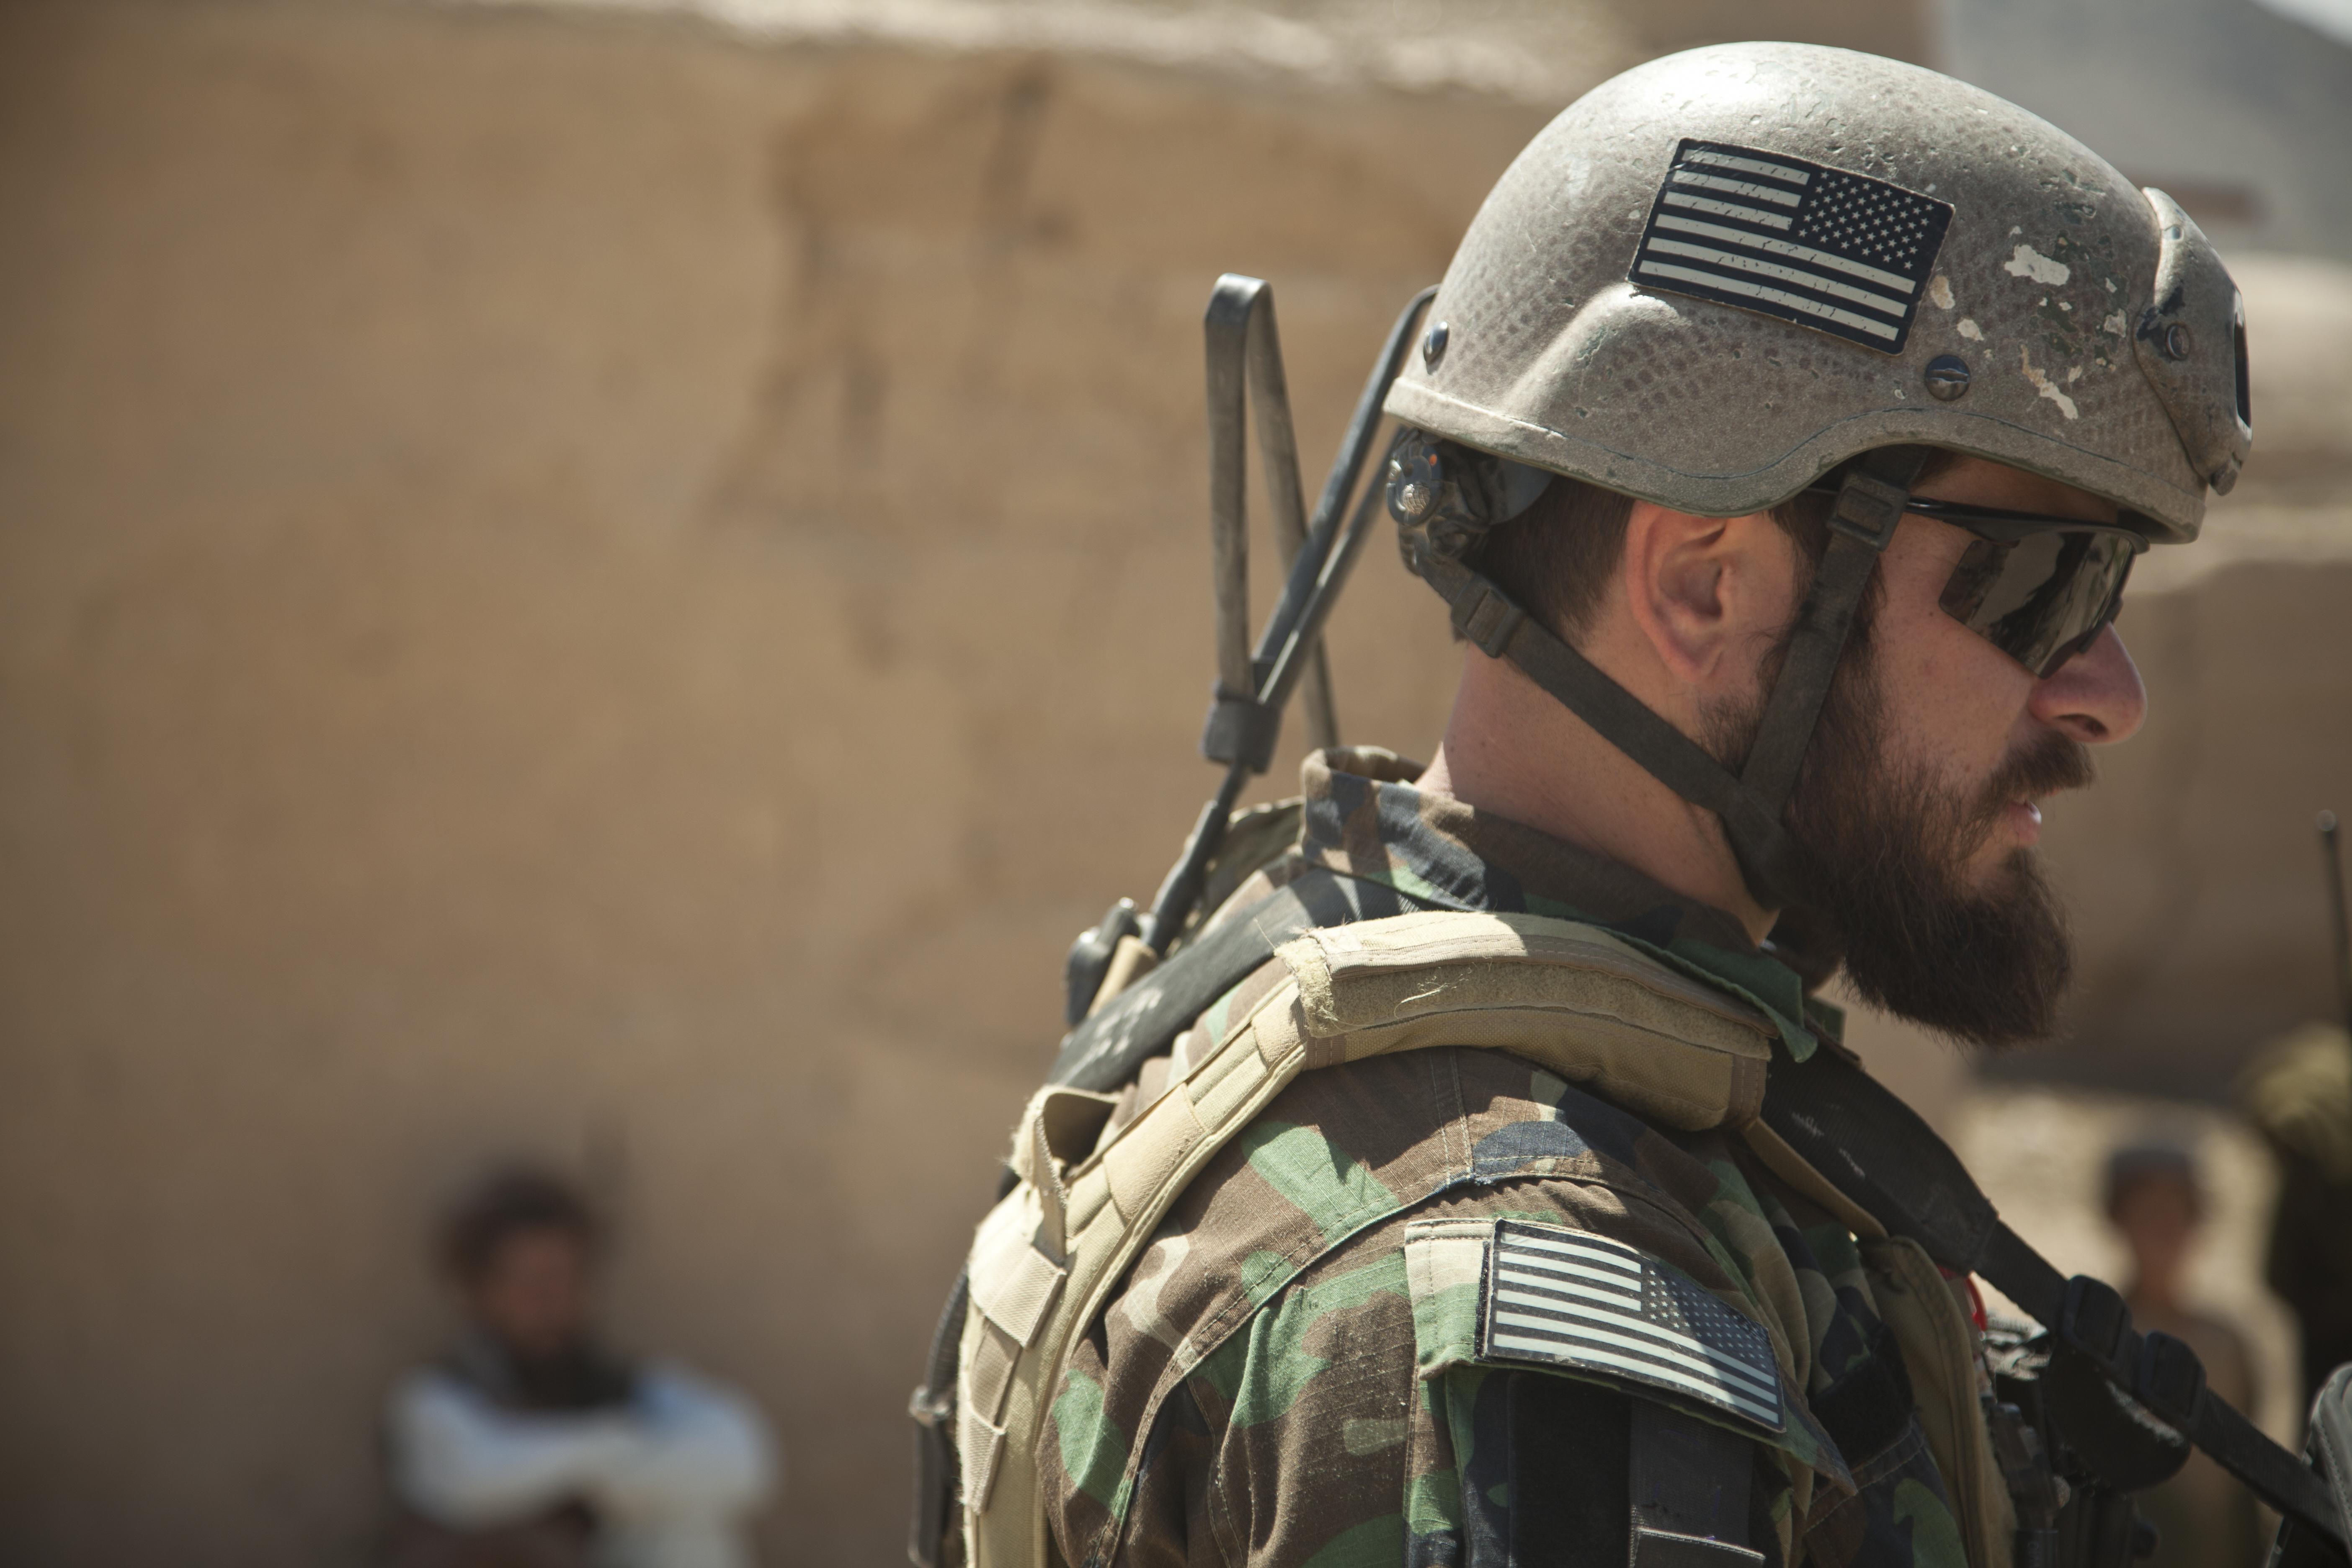 Delta Force Beard File:A U.S. Service me...